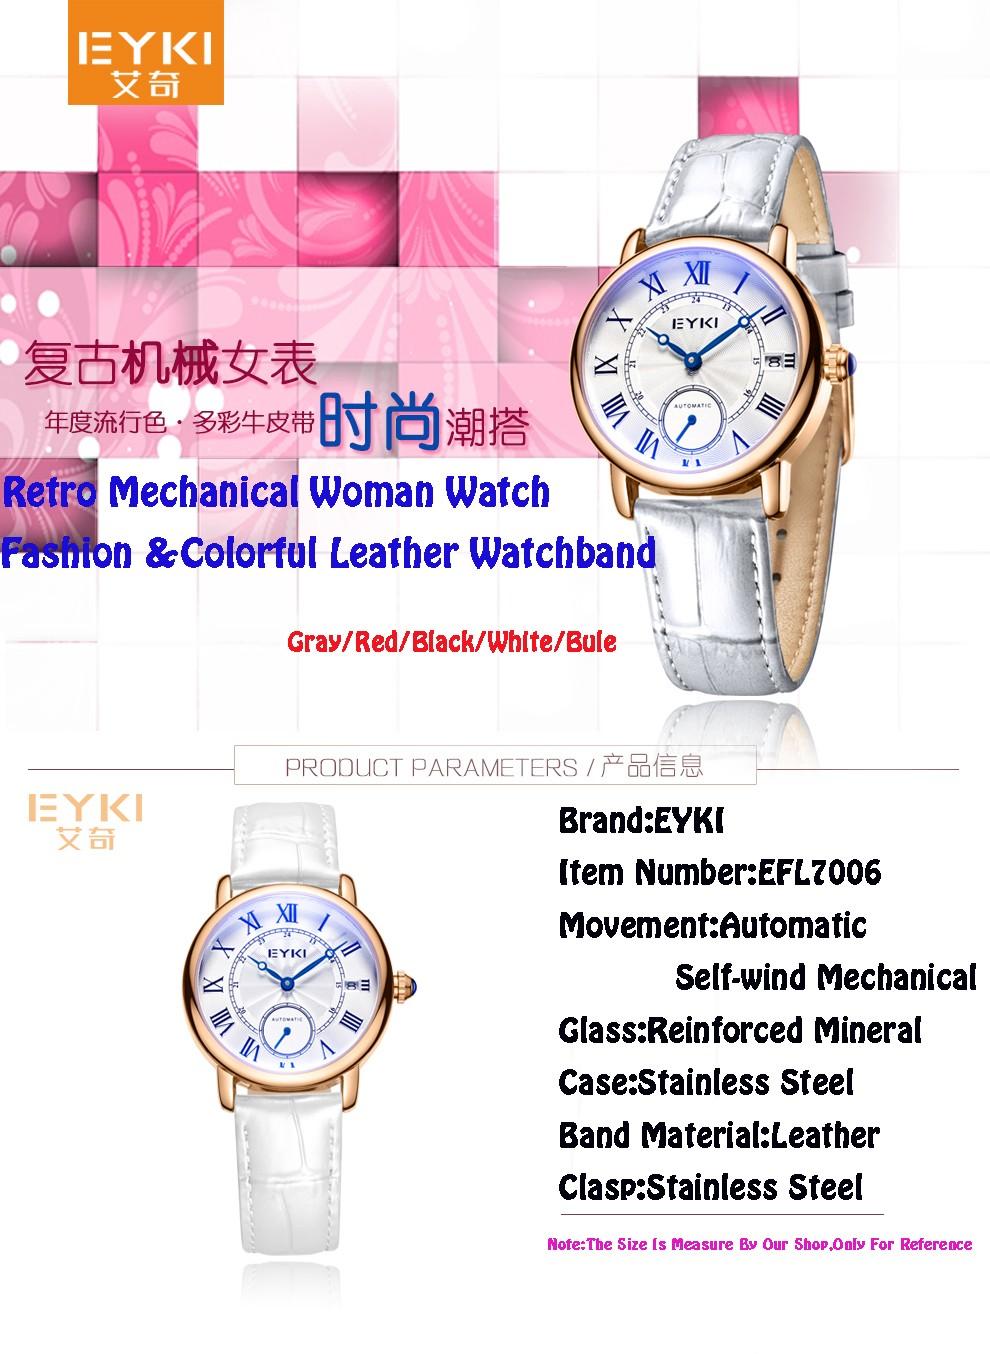 Newest EYKI Brand Fashion Woman Watches Luxury Sapphire Crystal Automatic Self-wind Mechanical Leather Wristwatch Reloj Mujer